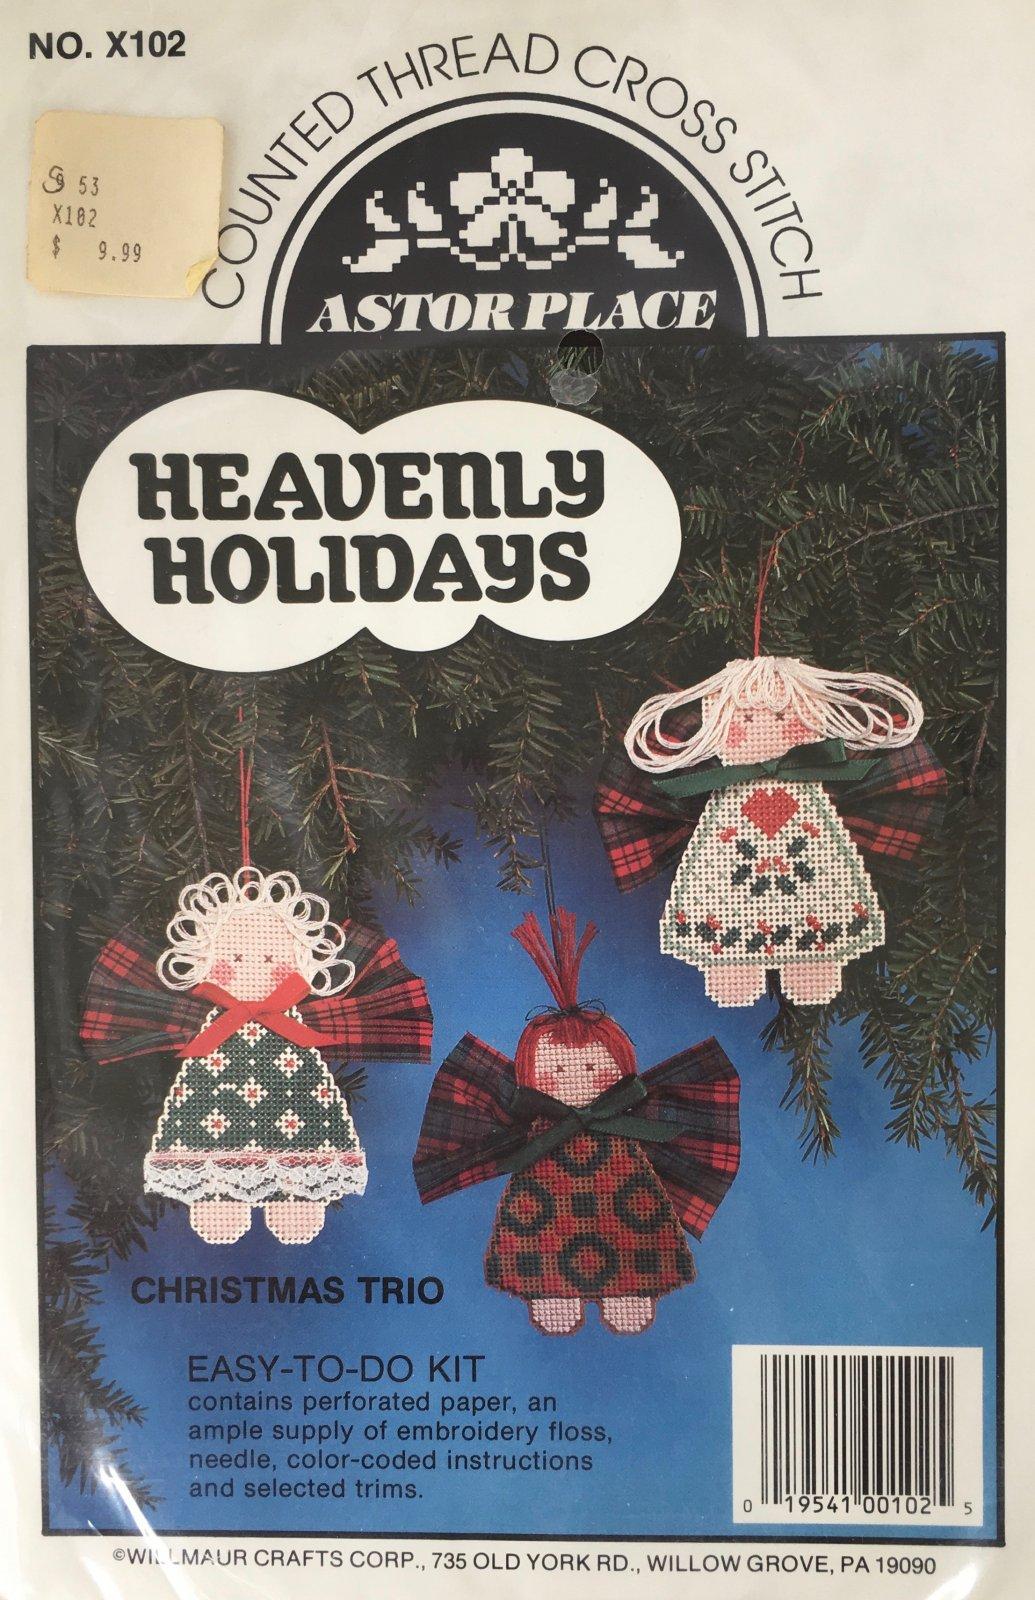 Astor Place: Heavenly Holidays Christmas Trio Kit X102